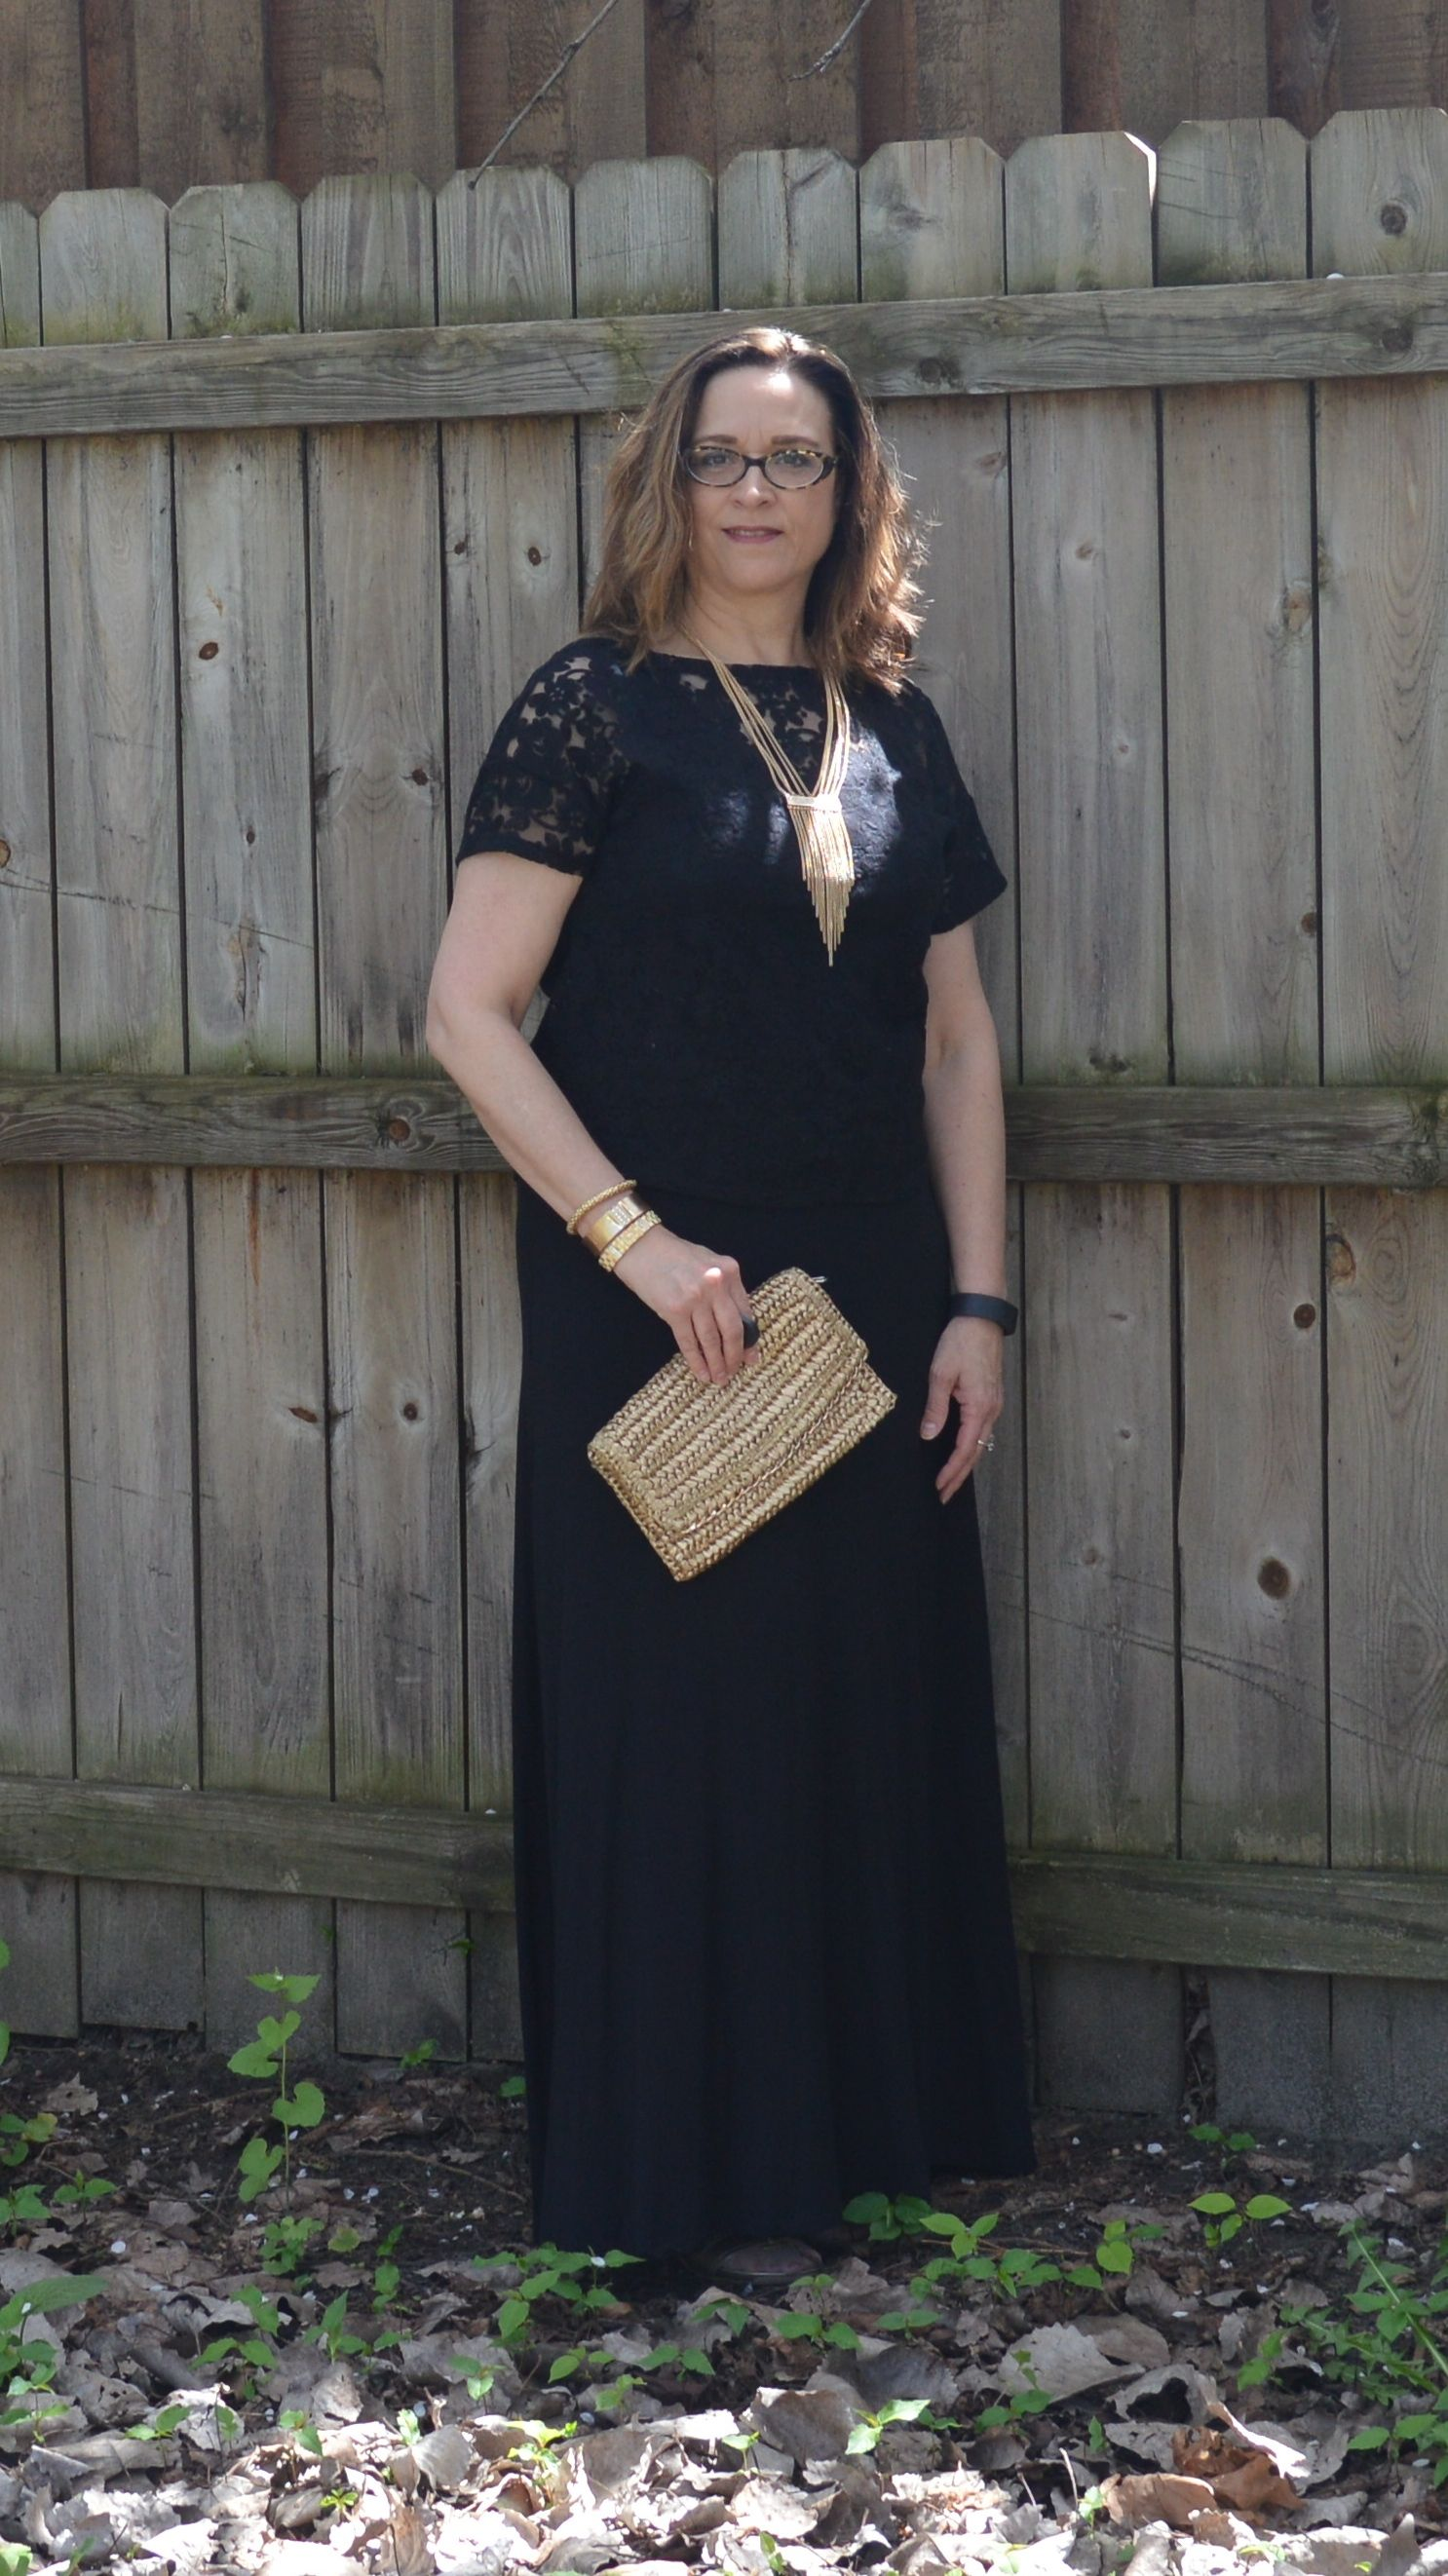 Monochrome outfit - black hue